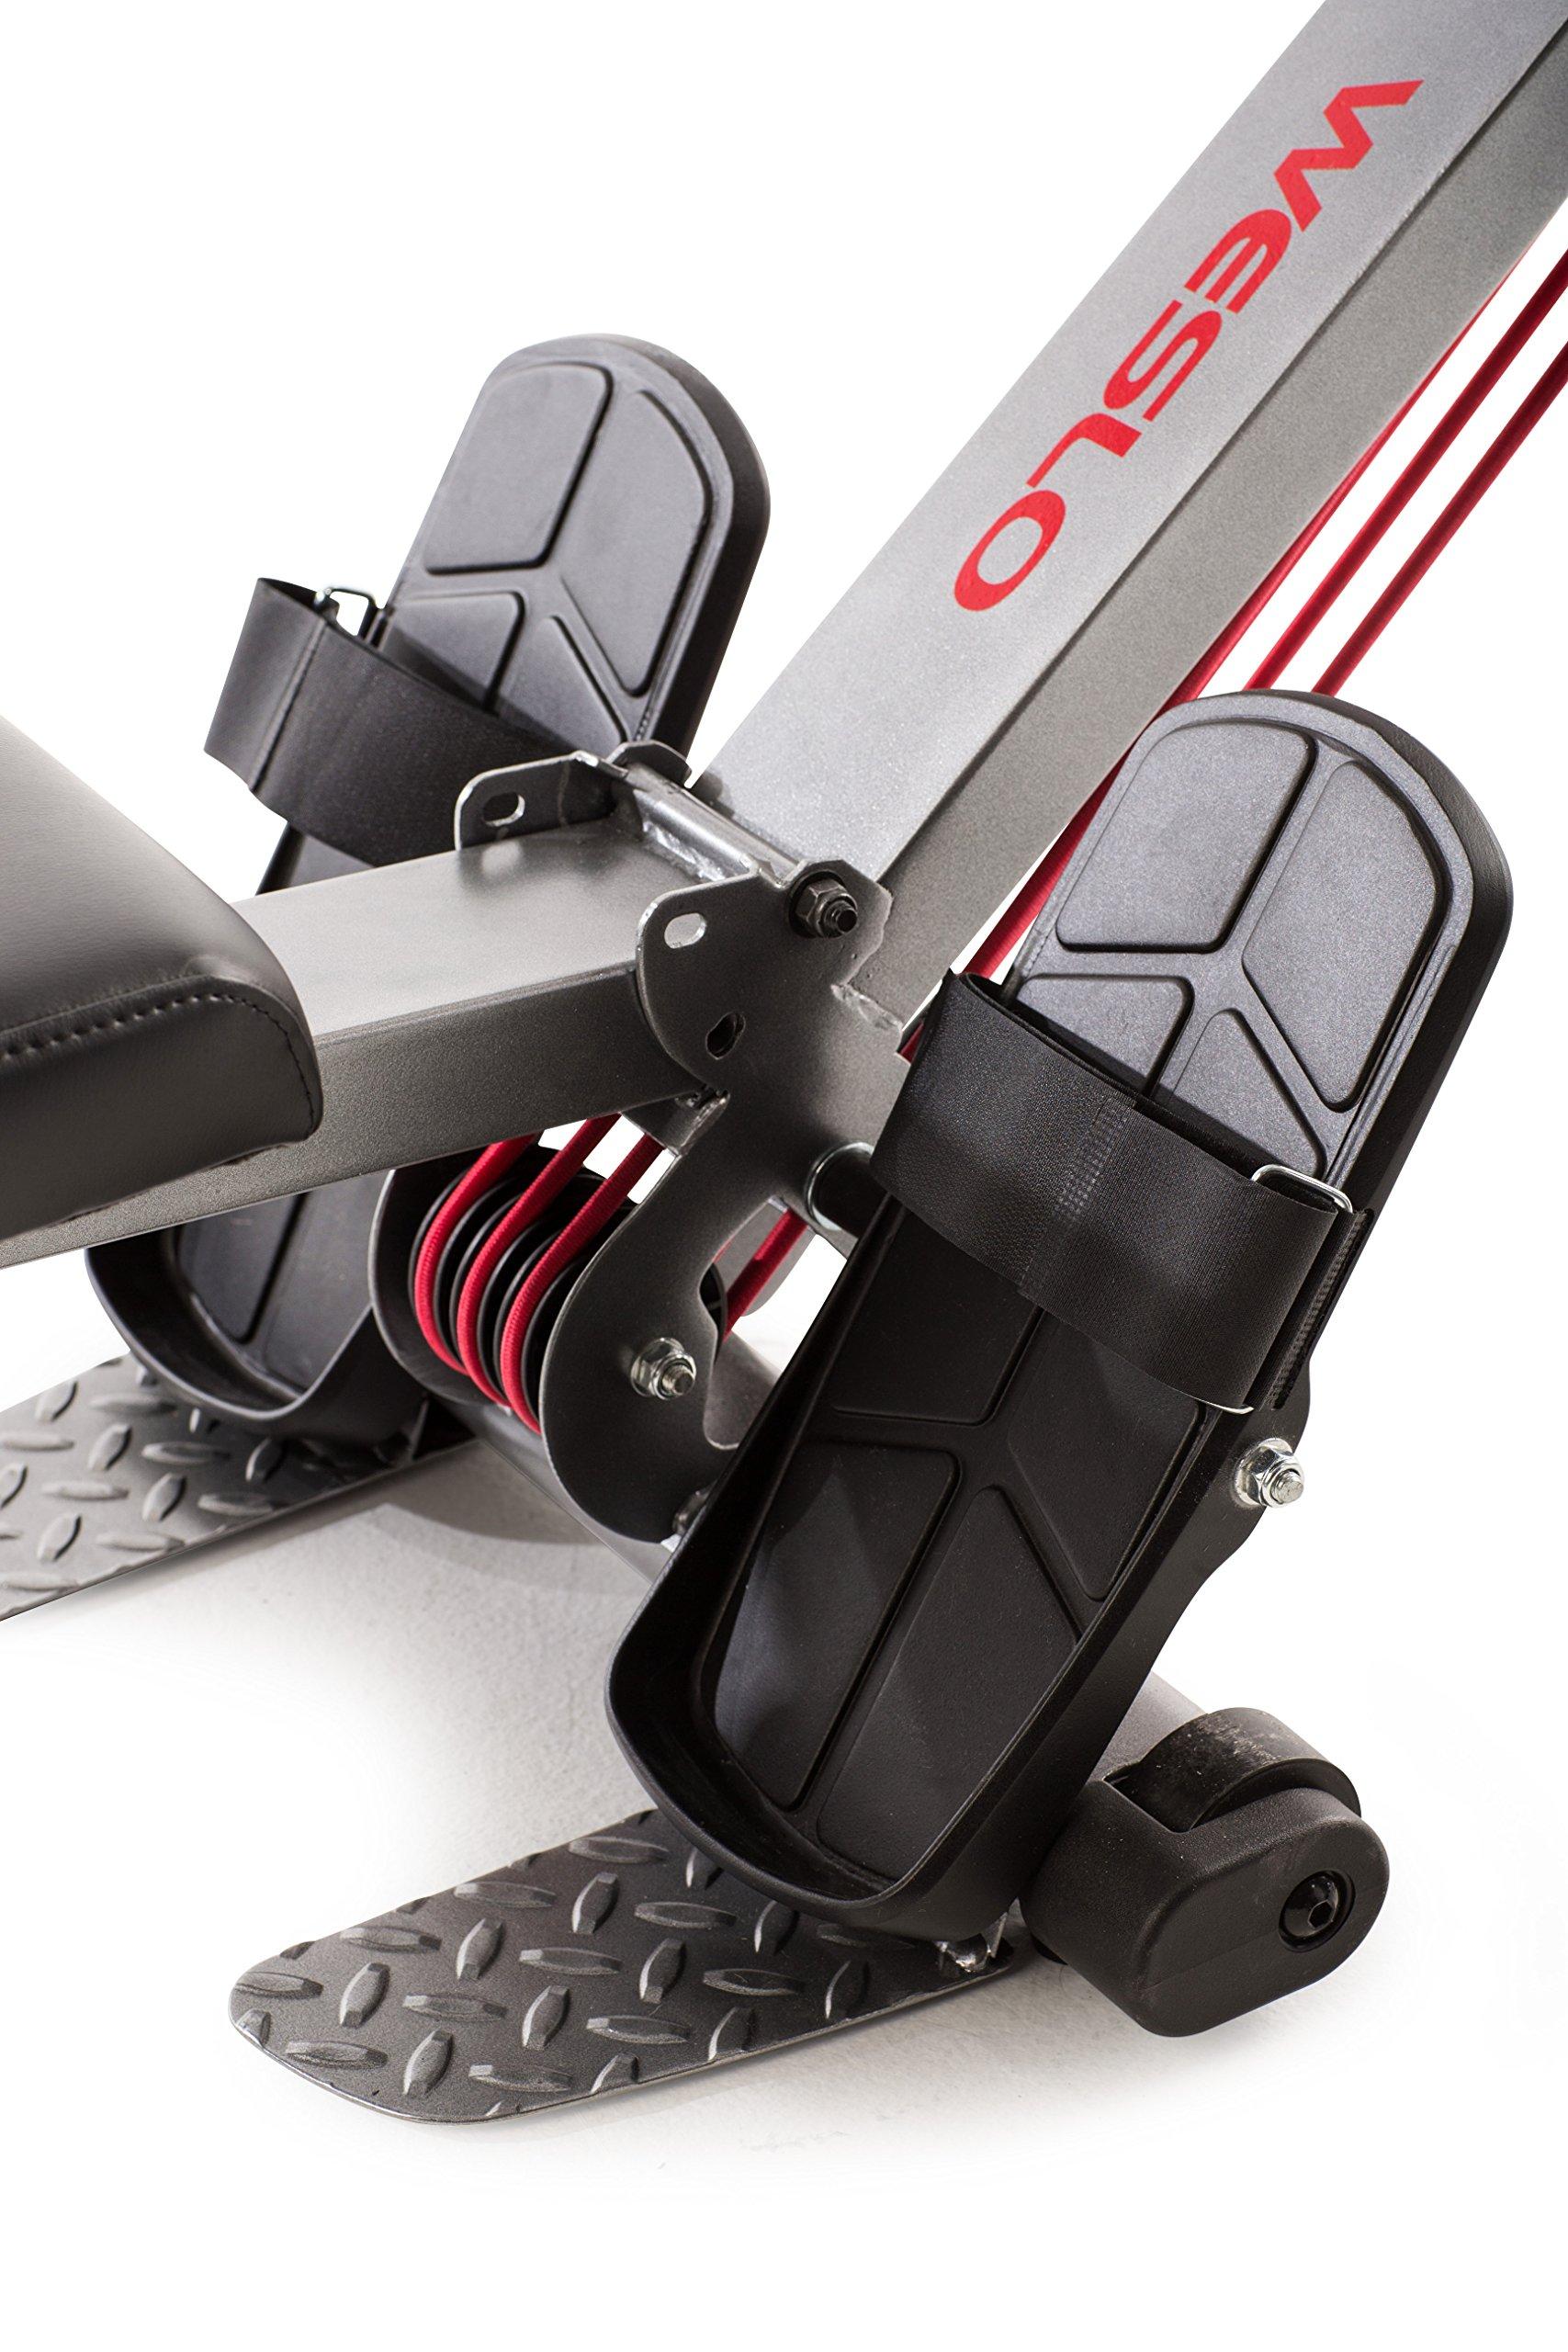 Weslo Flex 3.0 Rower by Weslo (Image #8)